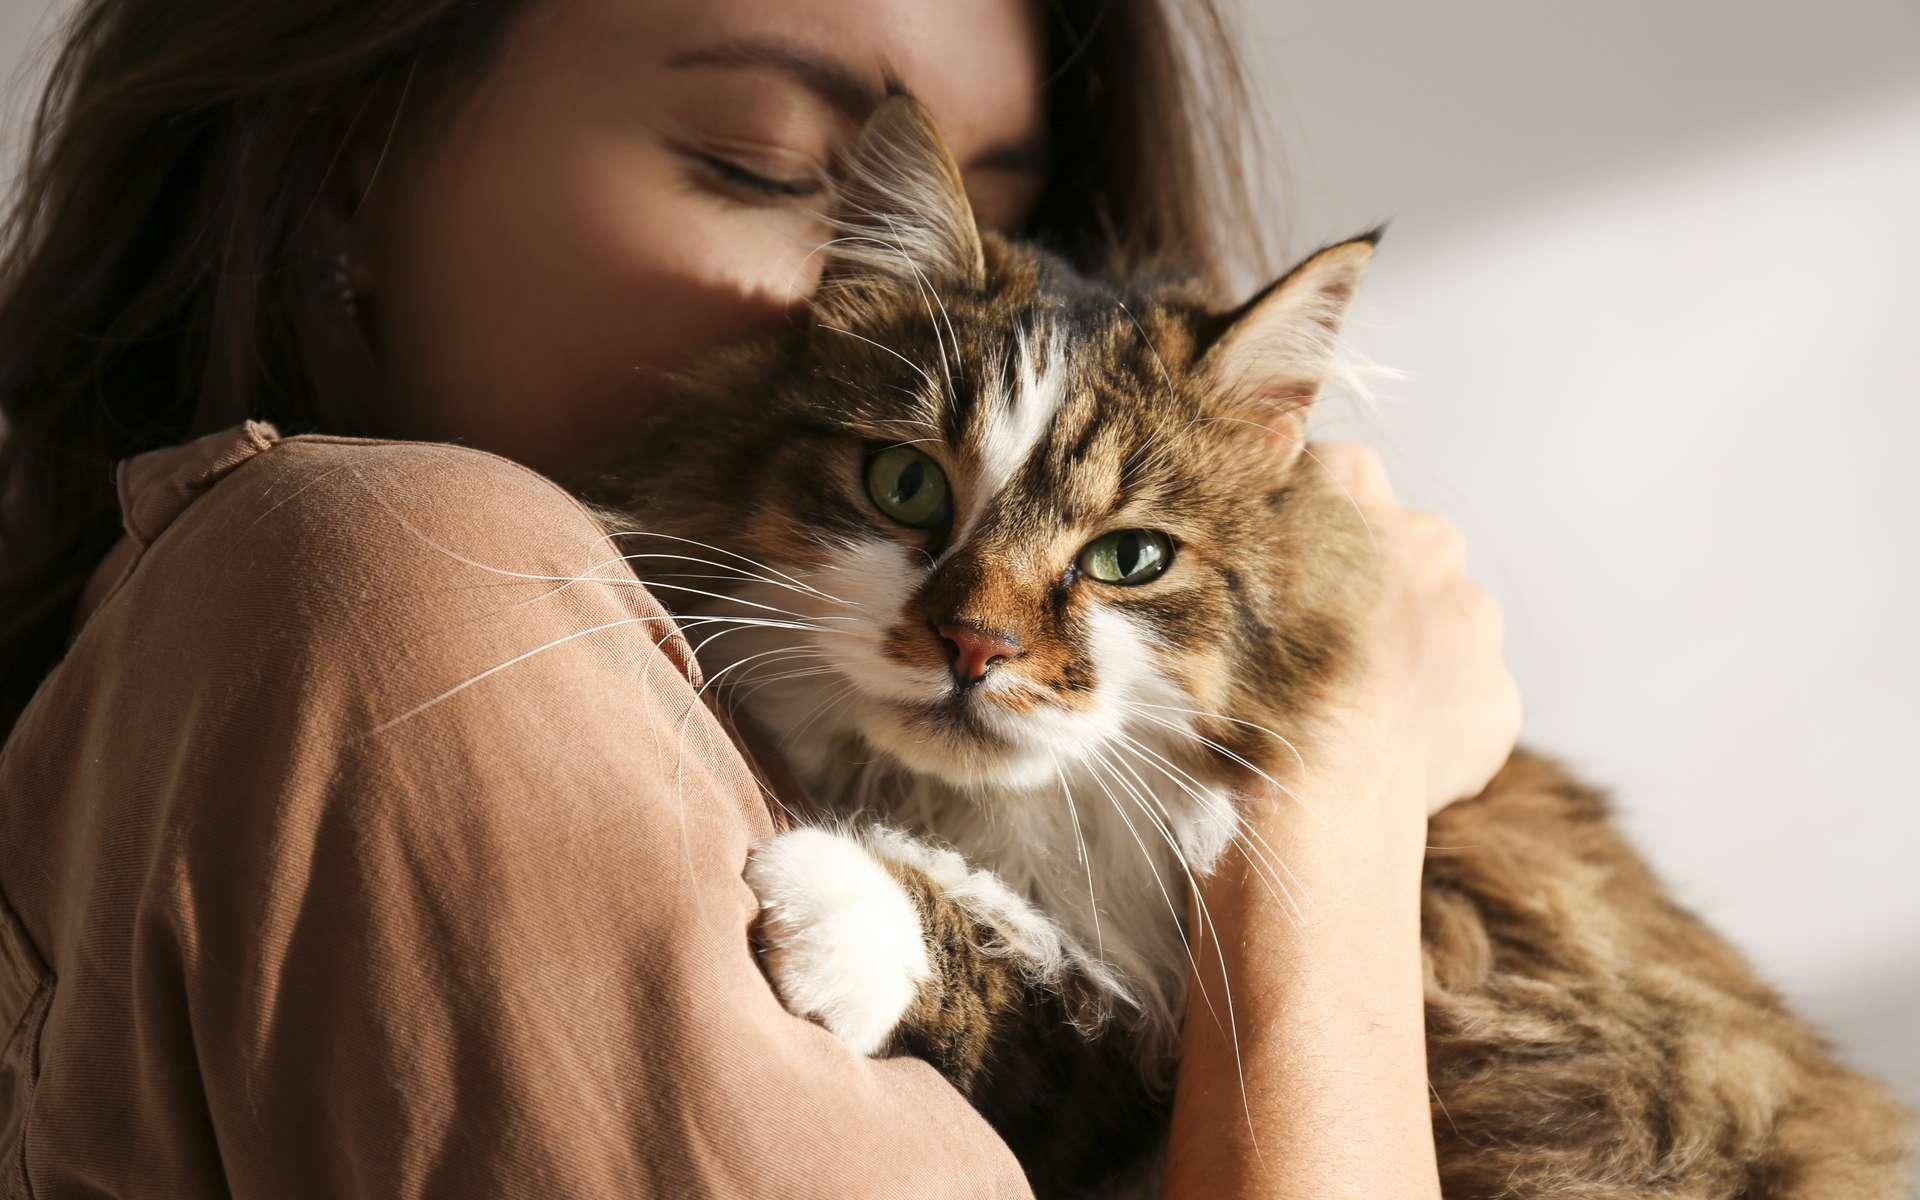 Comment le chat perçoit-il son humaine ? © Evrymmnt, Adobe Stock